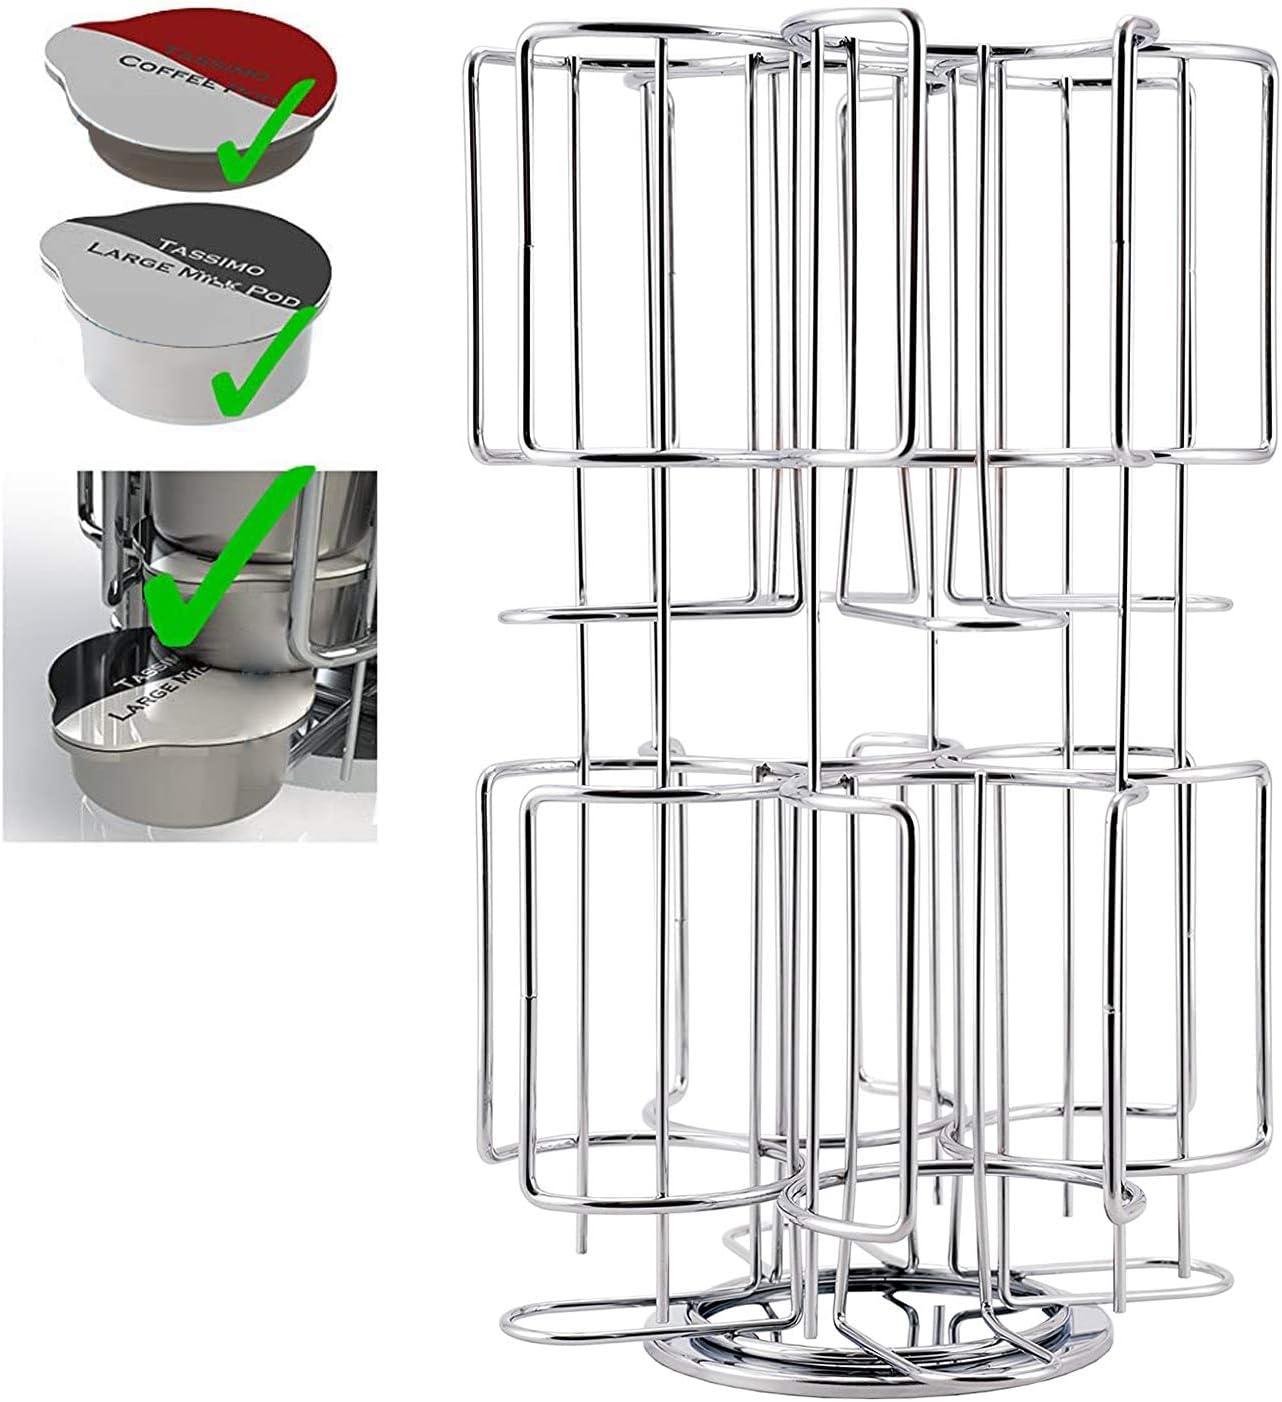 Hengda Kapselhalter Kapselspender,zur Aufbewahrung von 64 Tassimo-Kaffeekapseln,Silber,drehbar